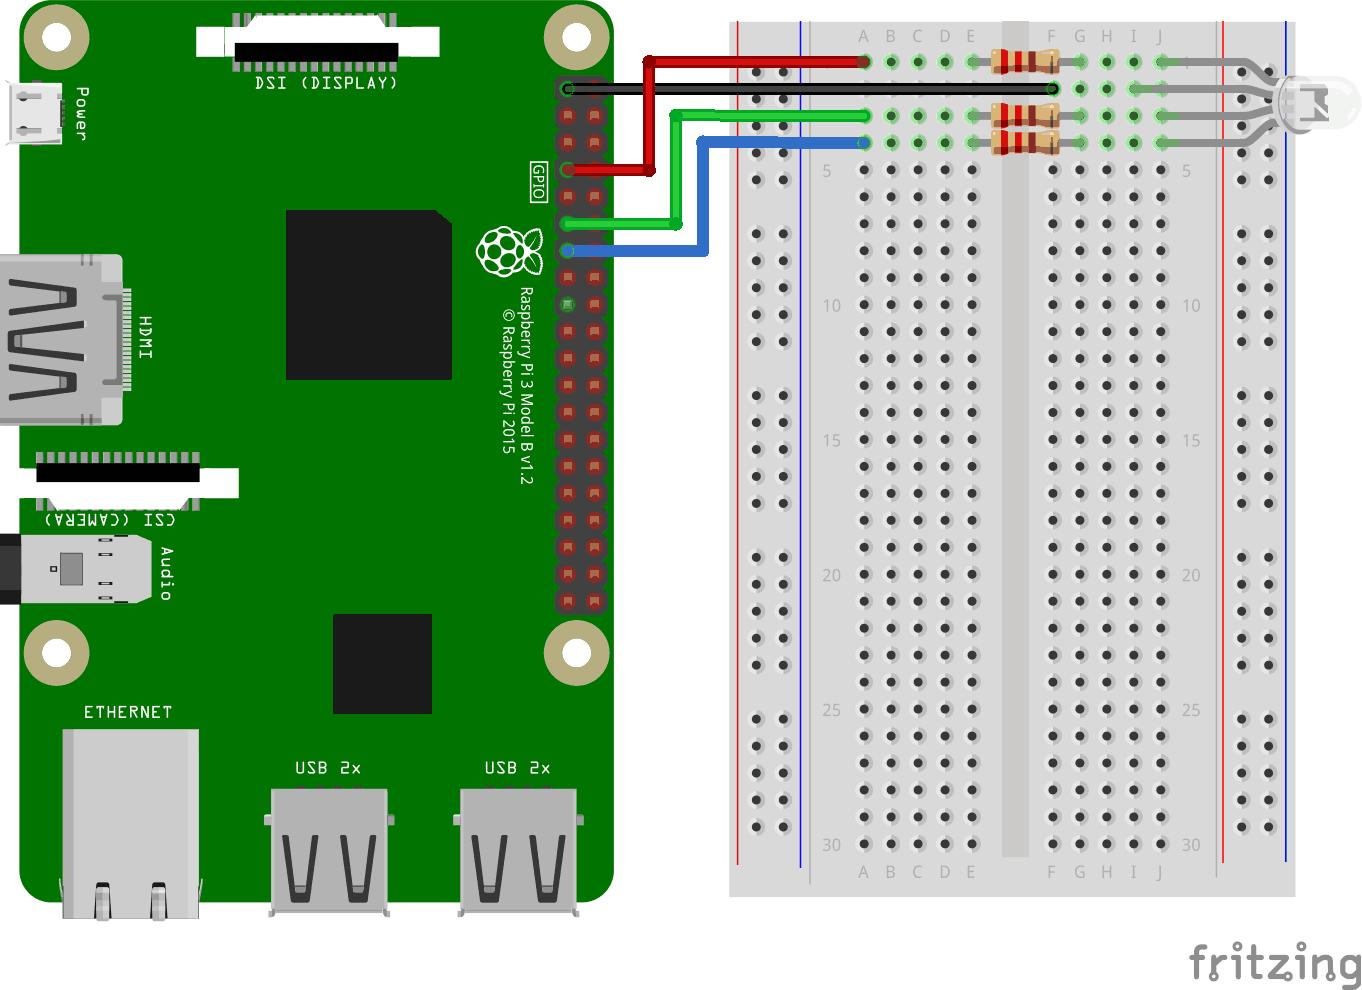 Node js Raspberry Pi RGB LED and WebSocket